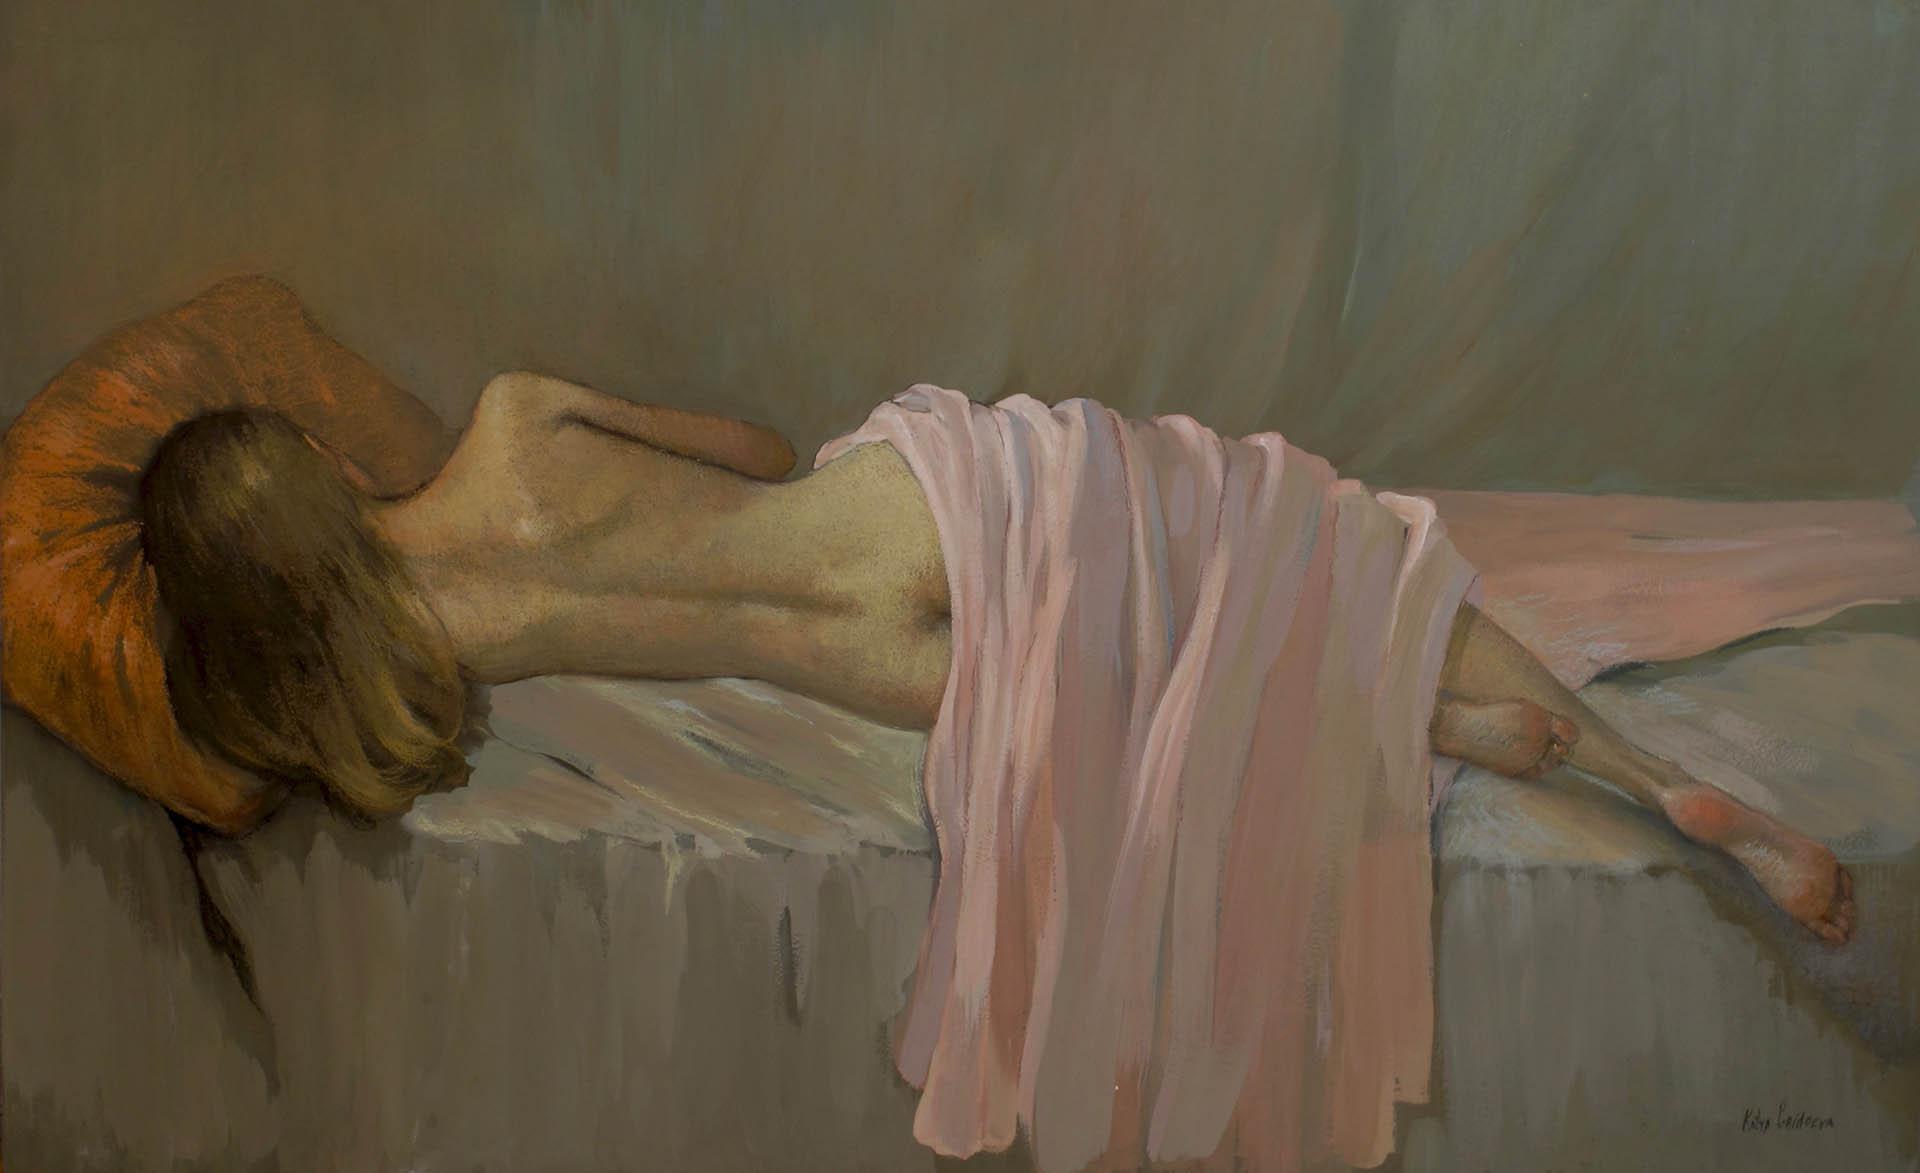 Катя Гриднева (Katya Gridneva), Картина - 38